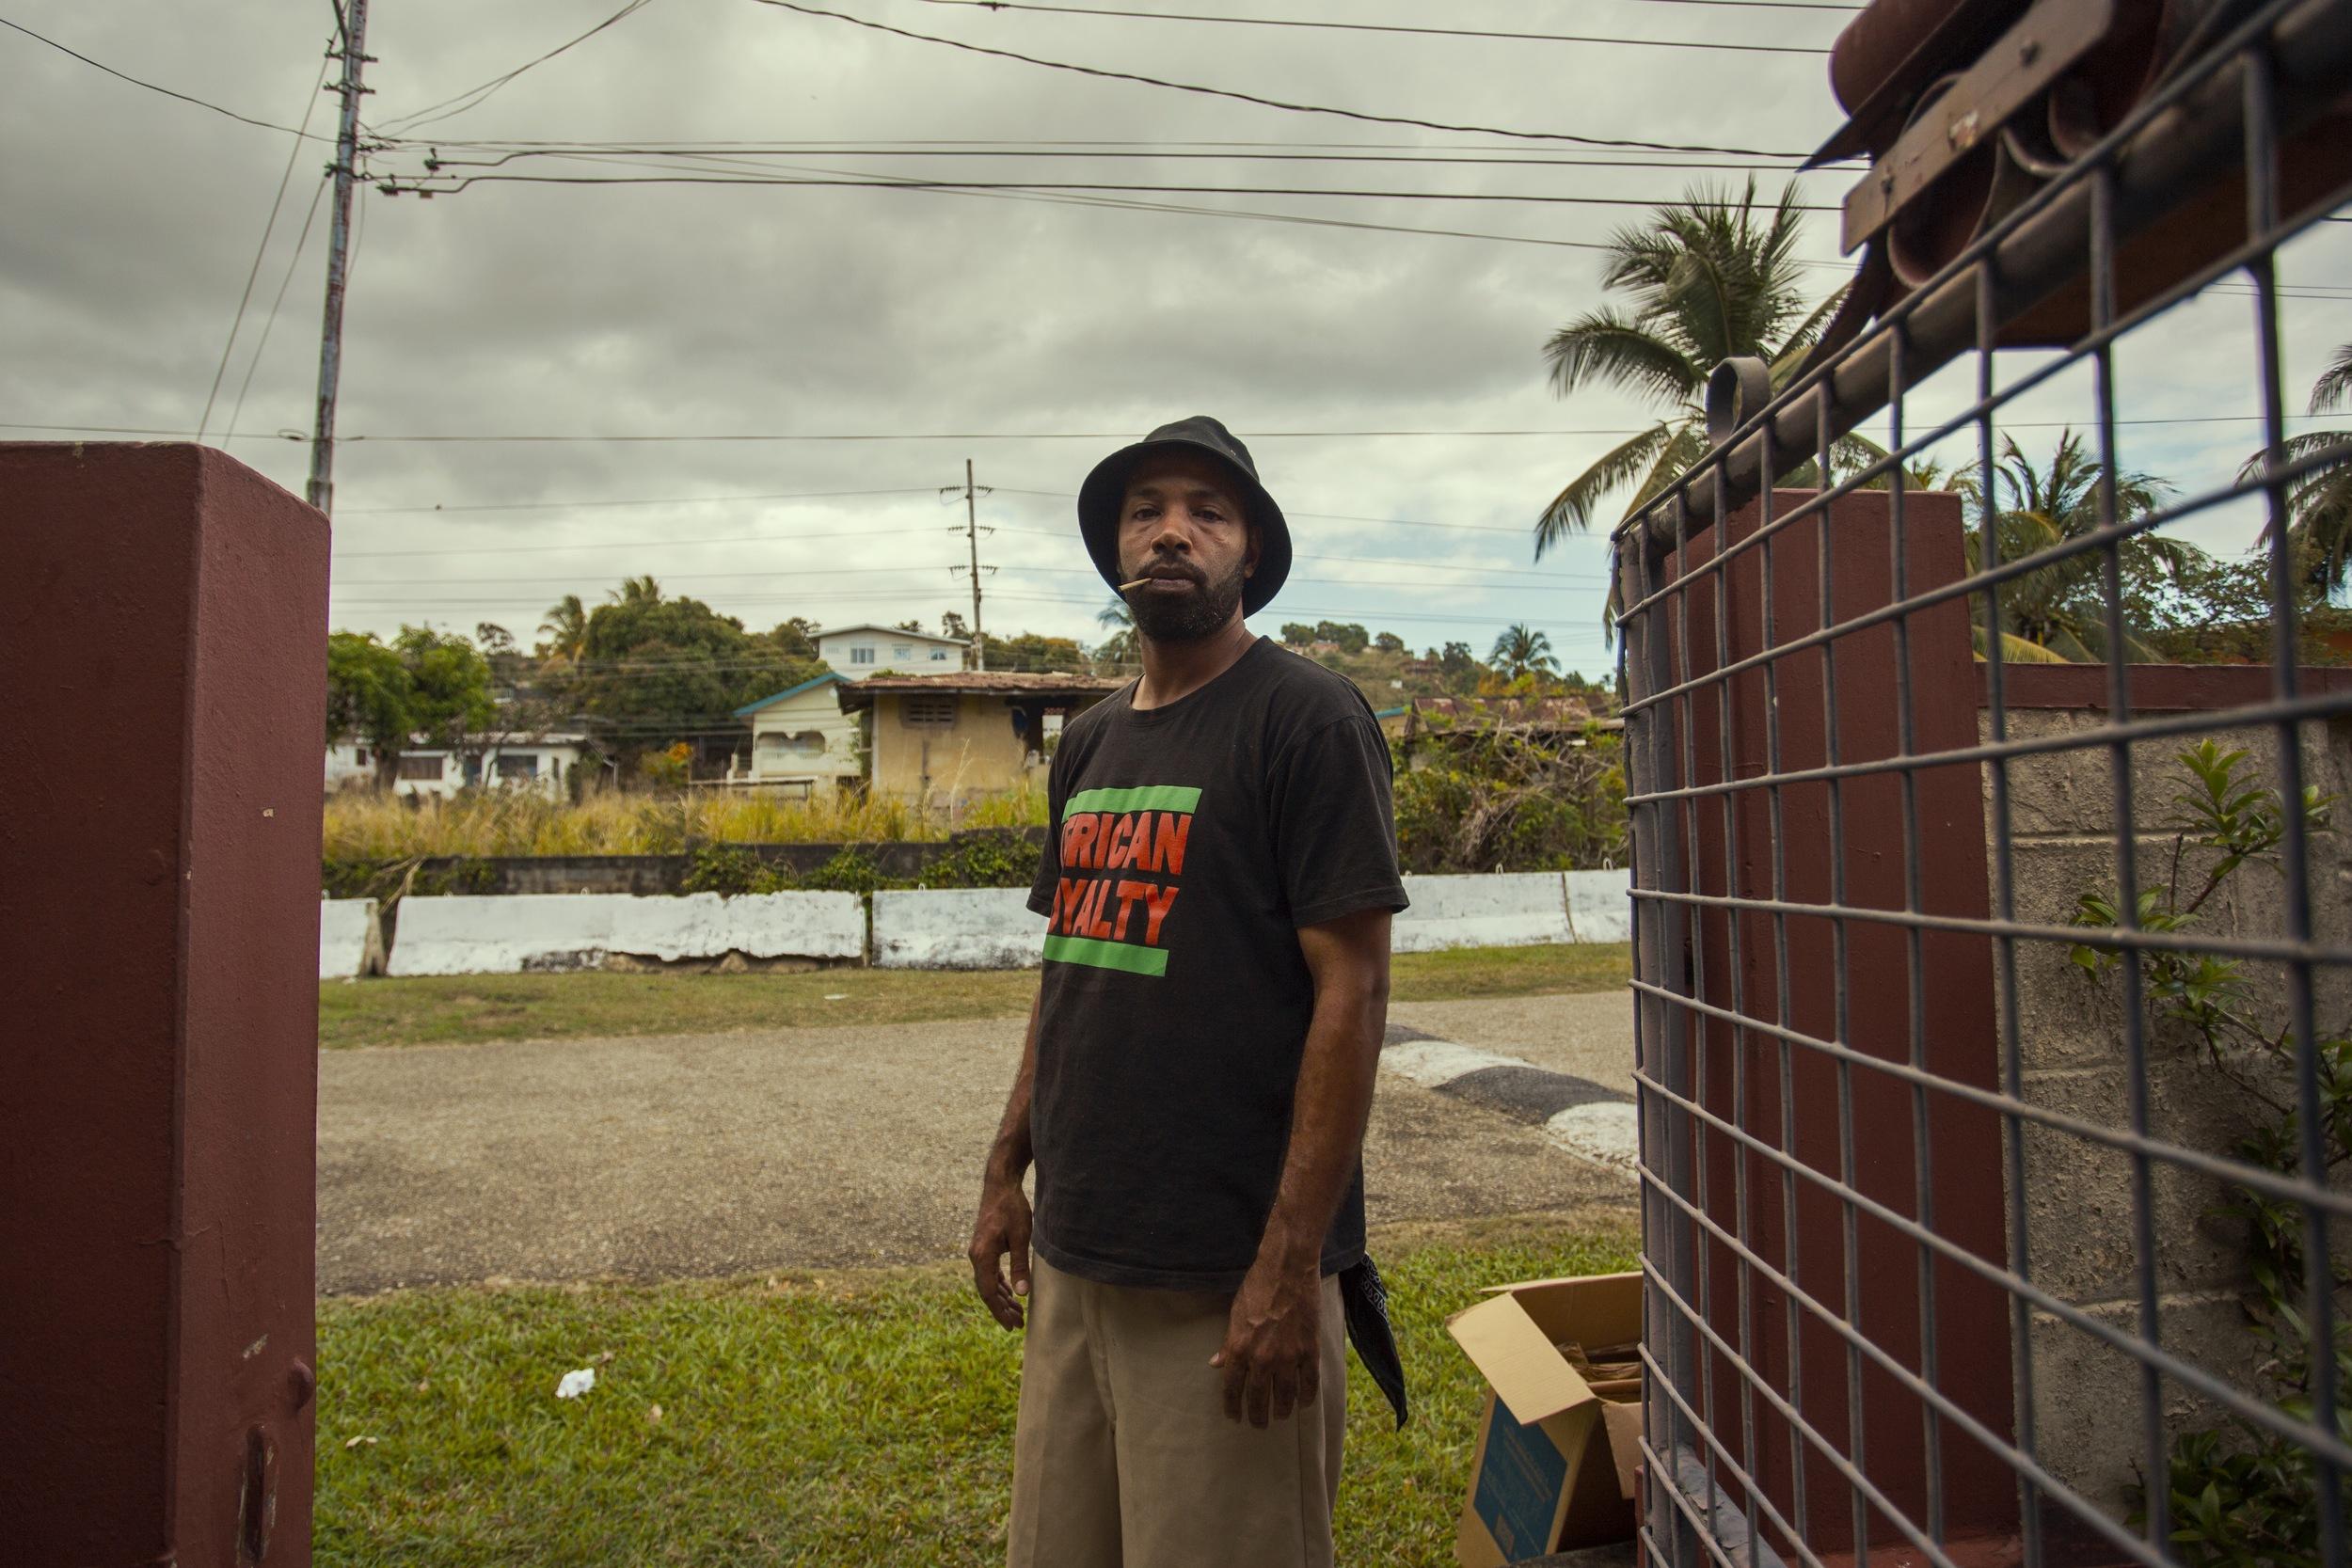 Make It Hapn at home, Barataria, Port of Spain, Trinidad. Photo: DGainz